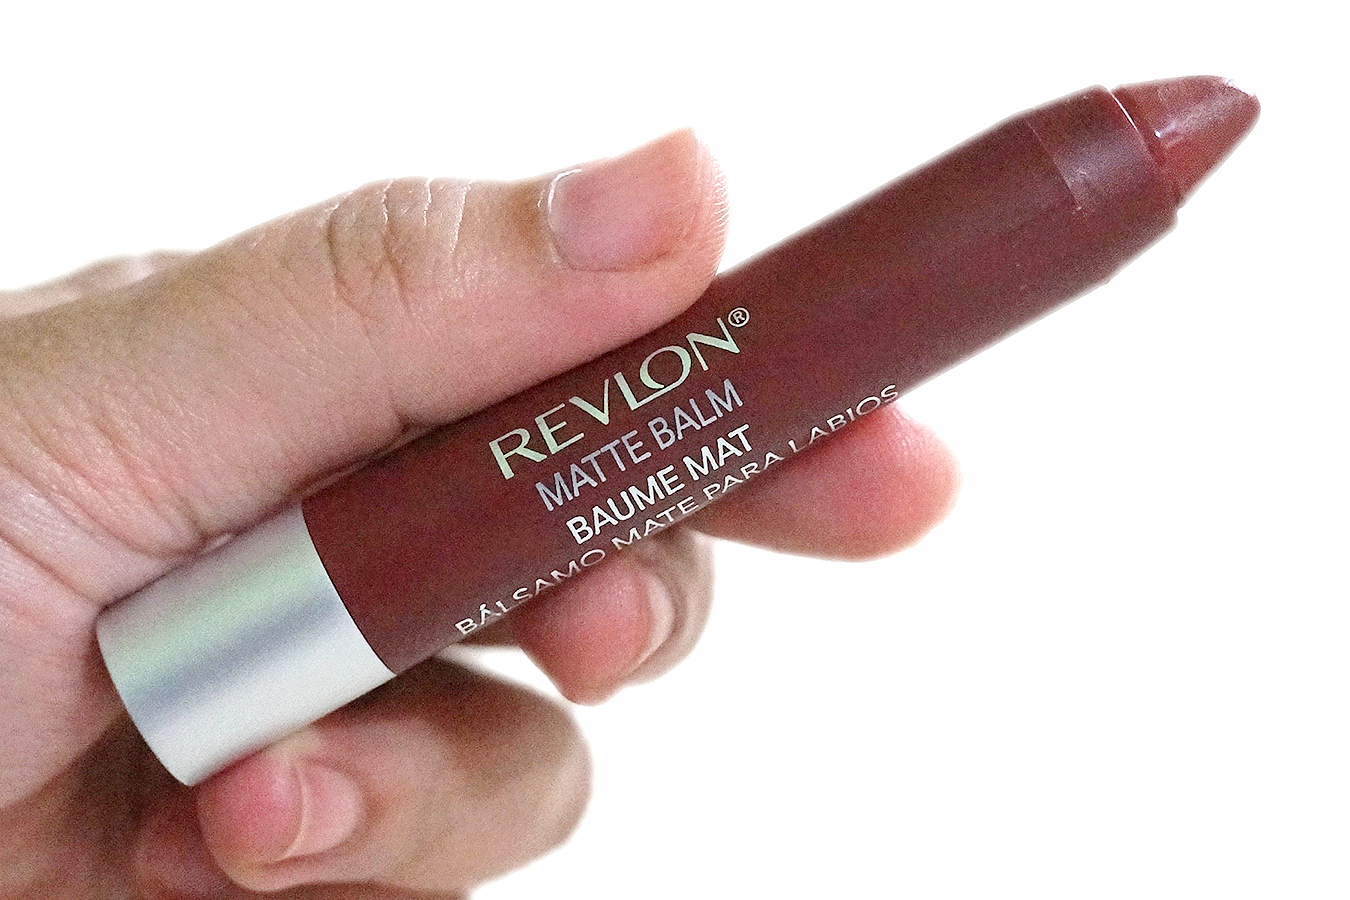 Revlon Colorburst Matte Balm In Fierce Review Photos Swatches Collorbust